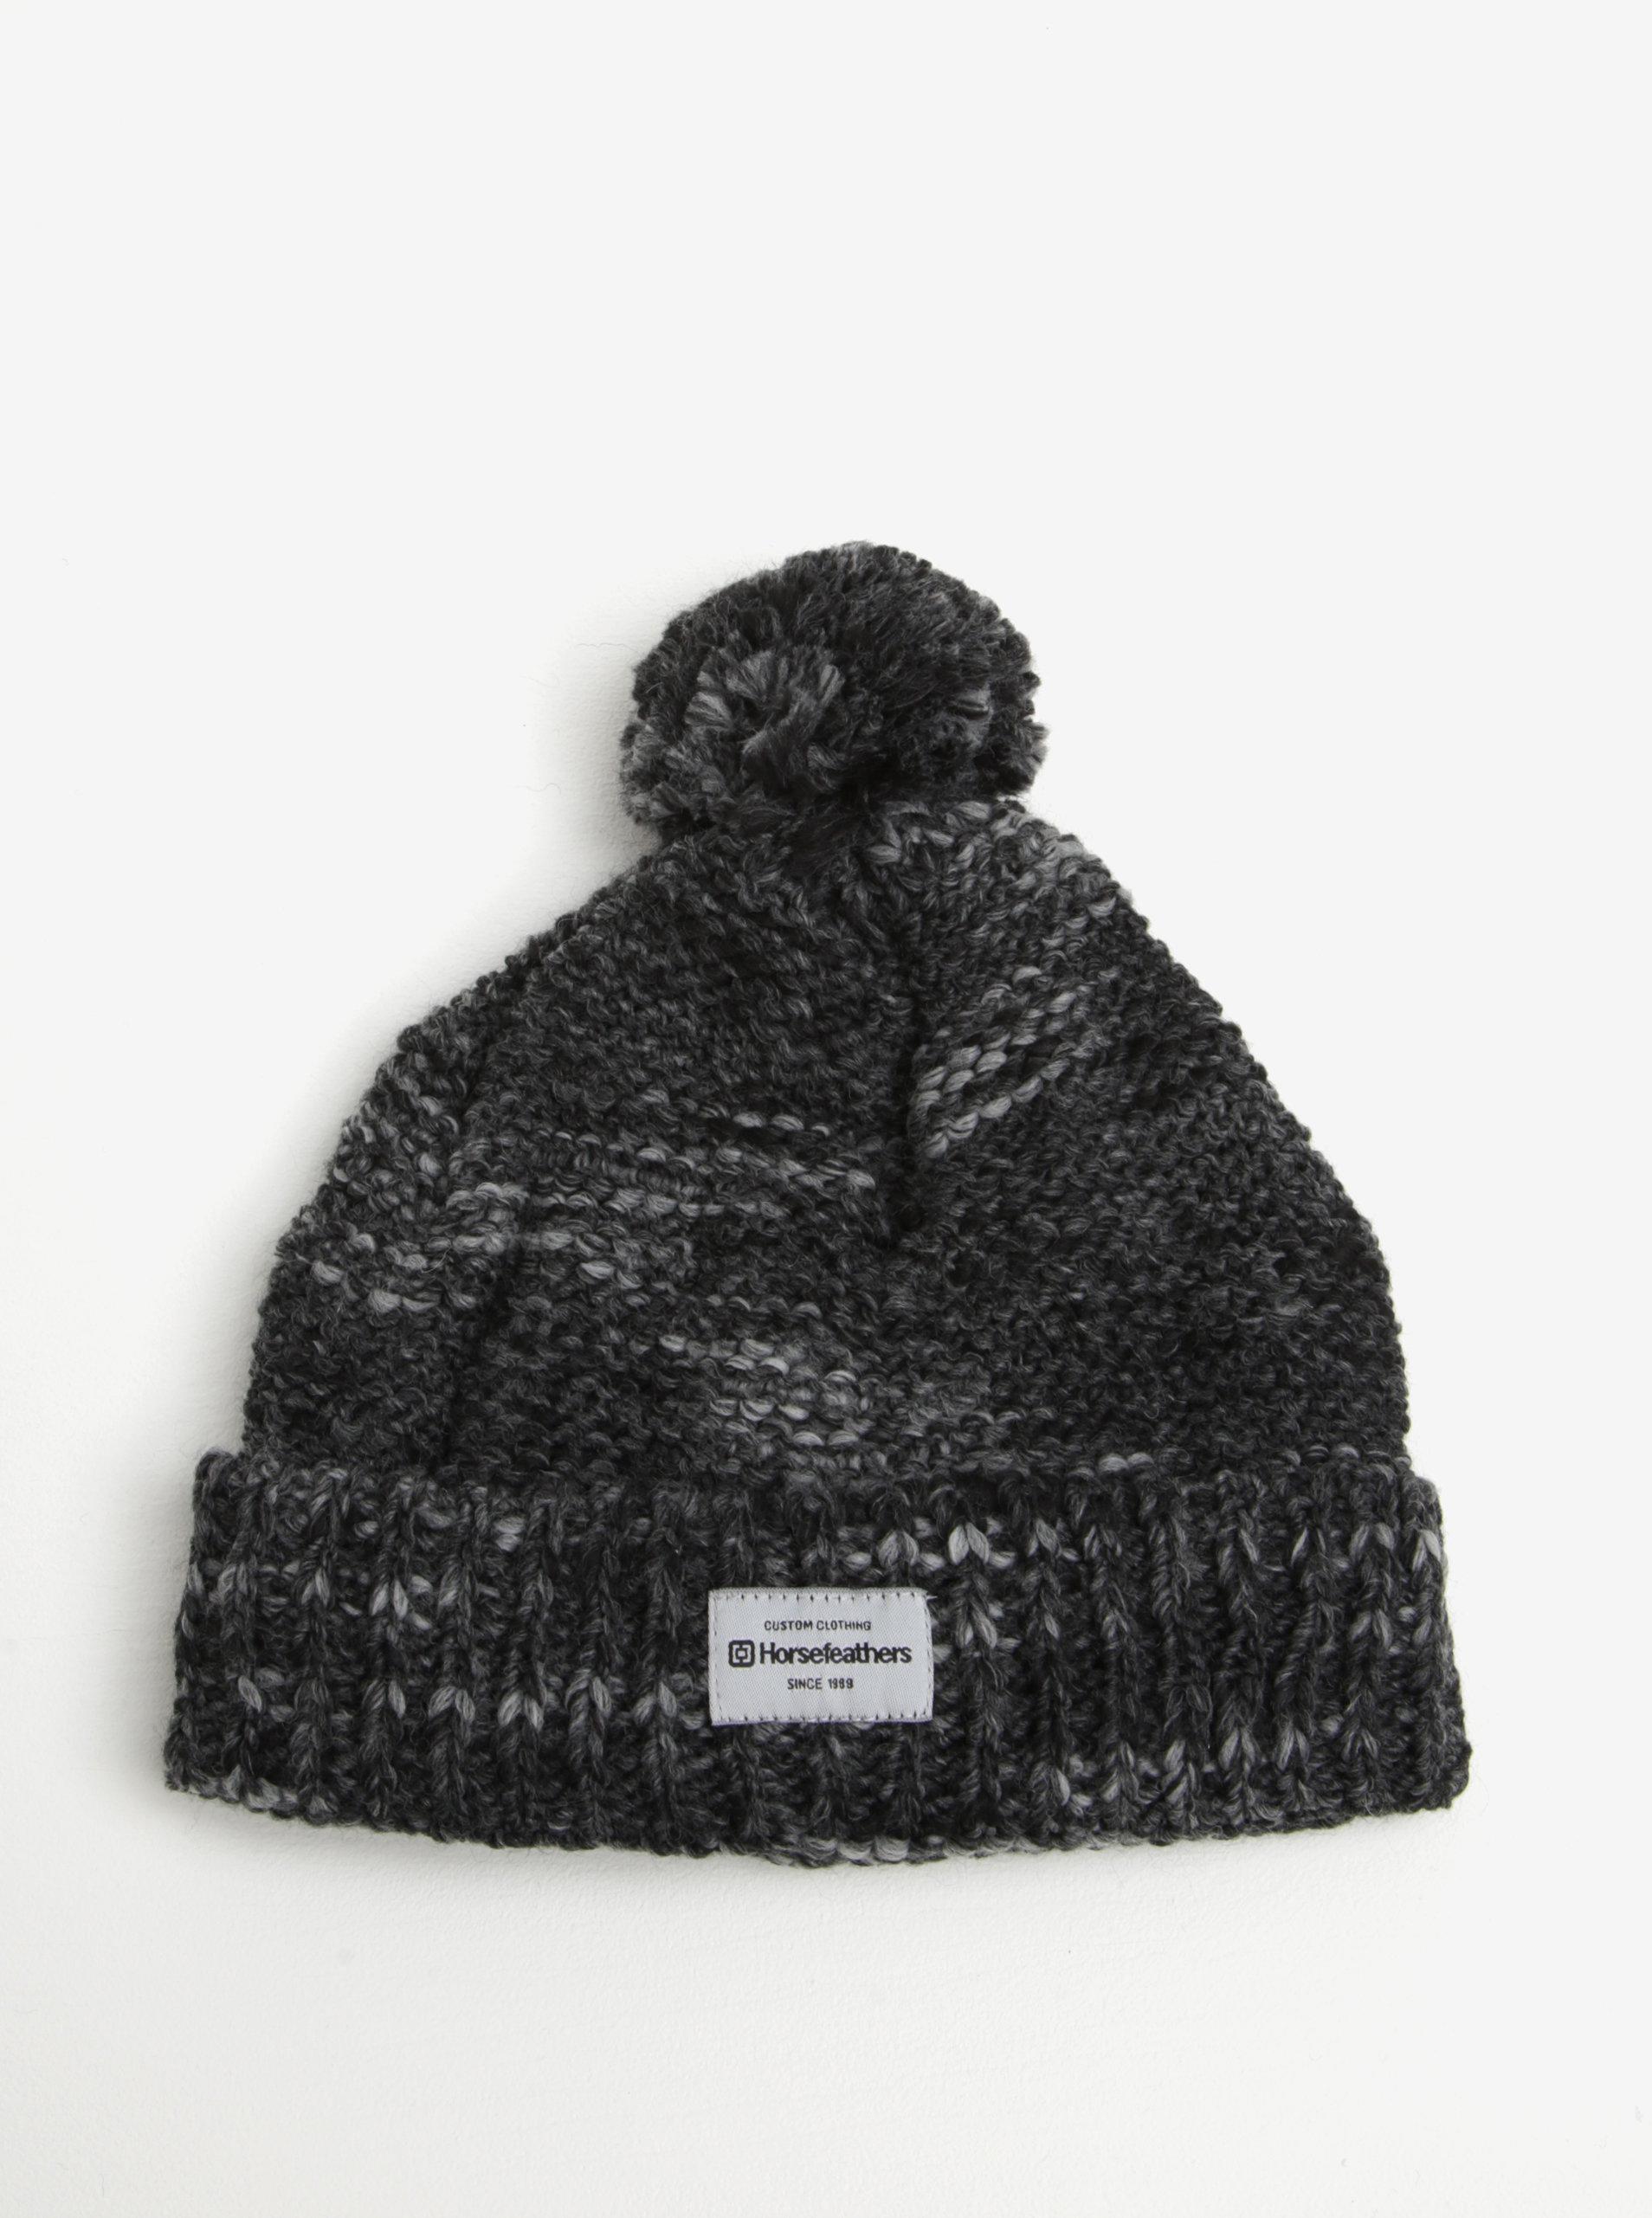 1c332e0c2 Sivá melírovaná dámska zimná čapica s prímesou vlny a brmbolcom  Horsefeathers Tania ...